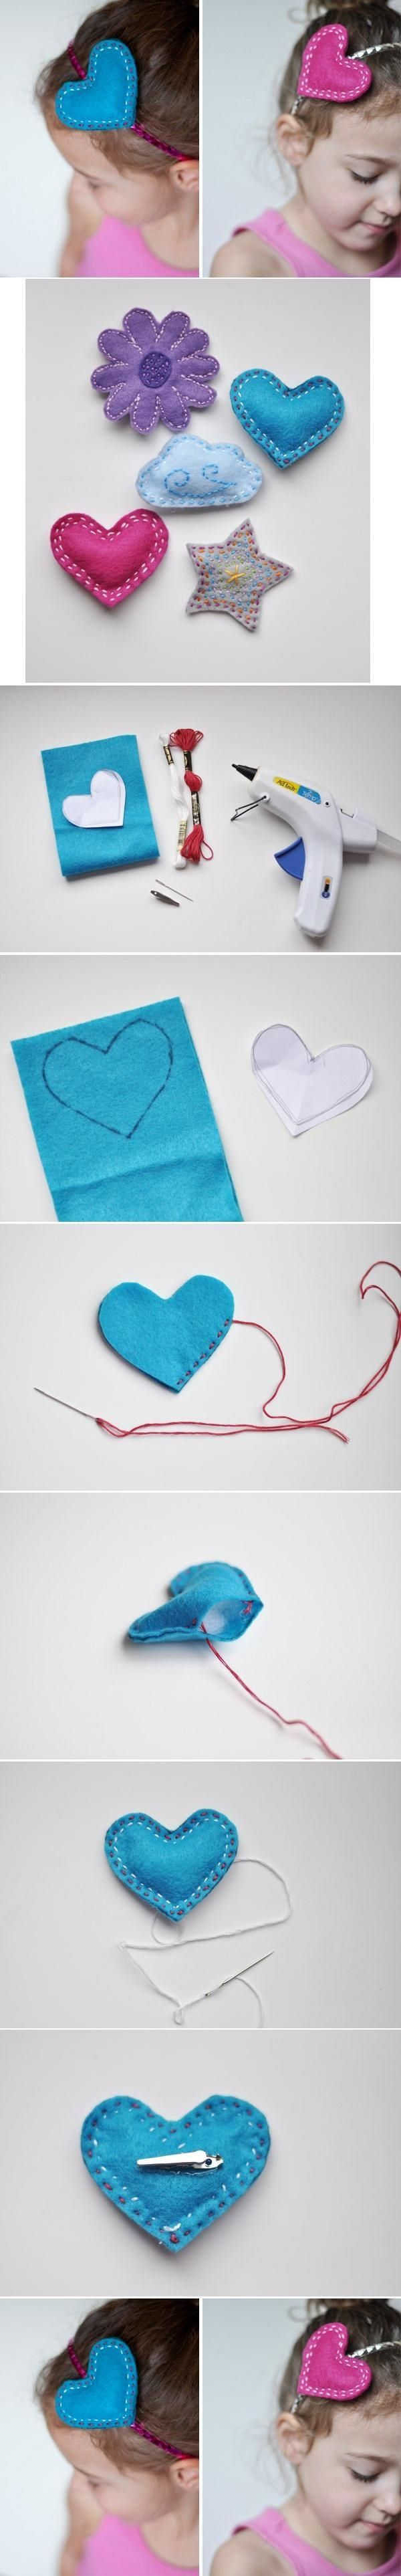 DIY Lovely Felt #Ornament hearts   #DIY